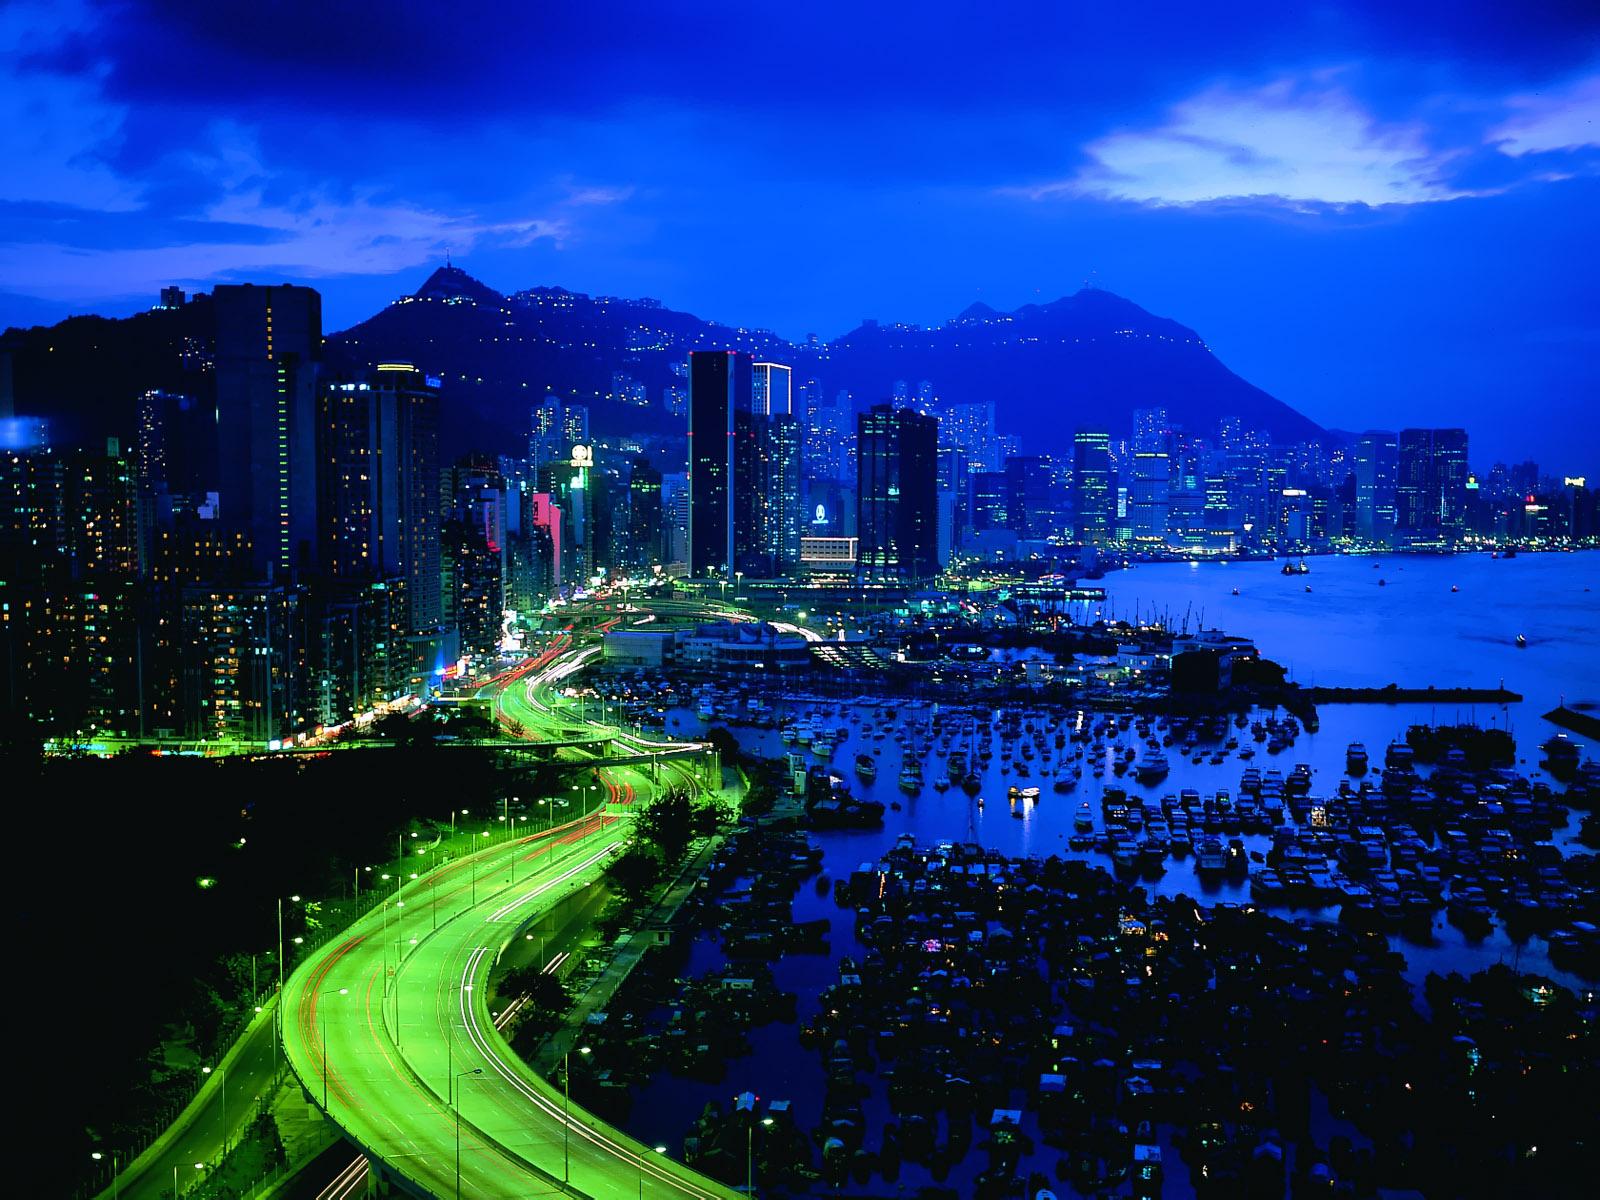 Night City Lights   HD Wallpapers Hd Desktop Wallpaper 1600x1200